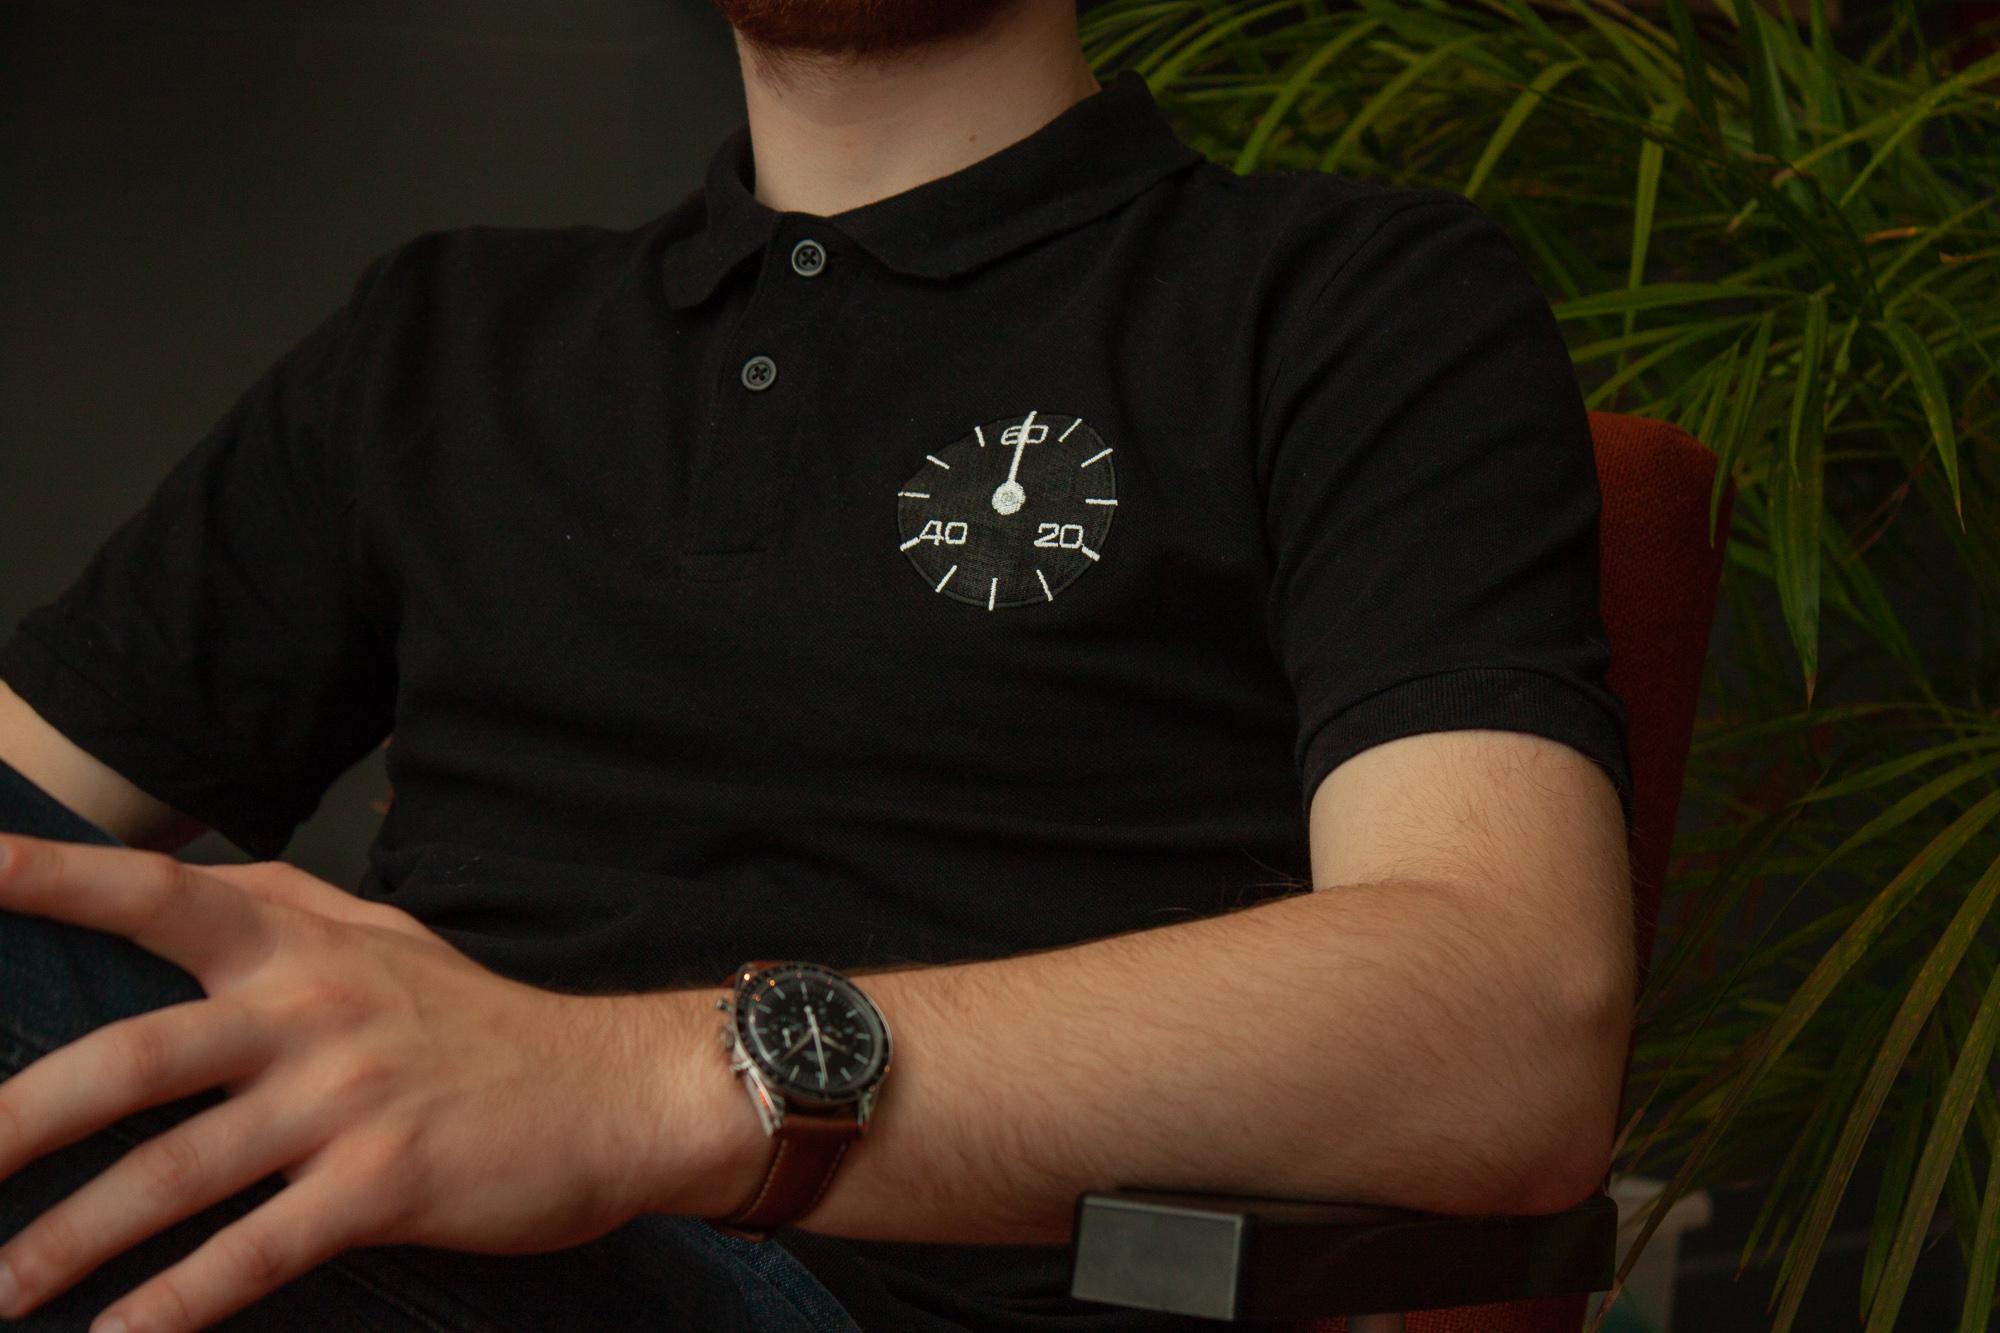 shirts bedrukken, t-shirt, klokken, zwarte shirt, dali, webshop, illustratie laten maken, t-shirts laten ontwerpen, thirts borduren, ontwerpen, cadeaushop Rotterdam, Delfshaven winkels, kleding ontwerpen, illustratie ontwerpen, t-shirts ontwerpen